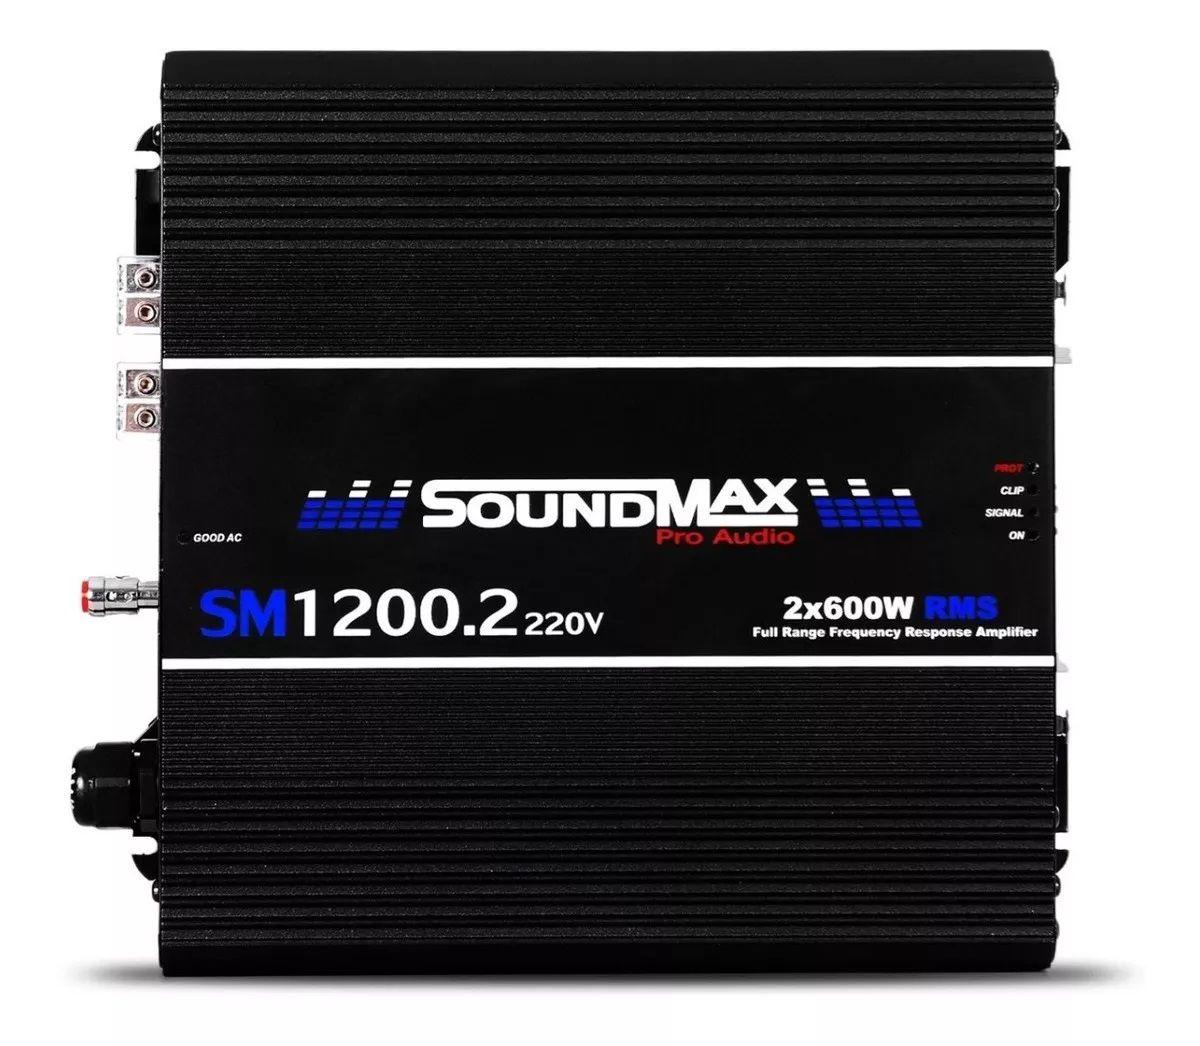 Módulo Amplificador Soundmax 1.2 220v